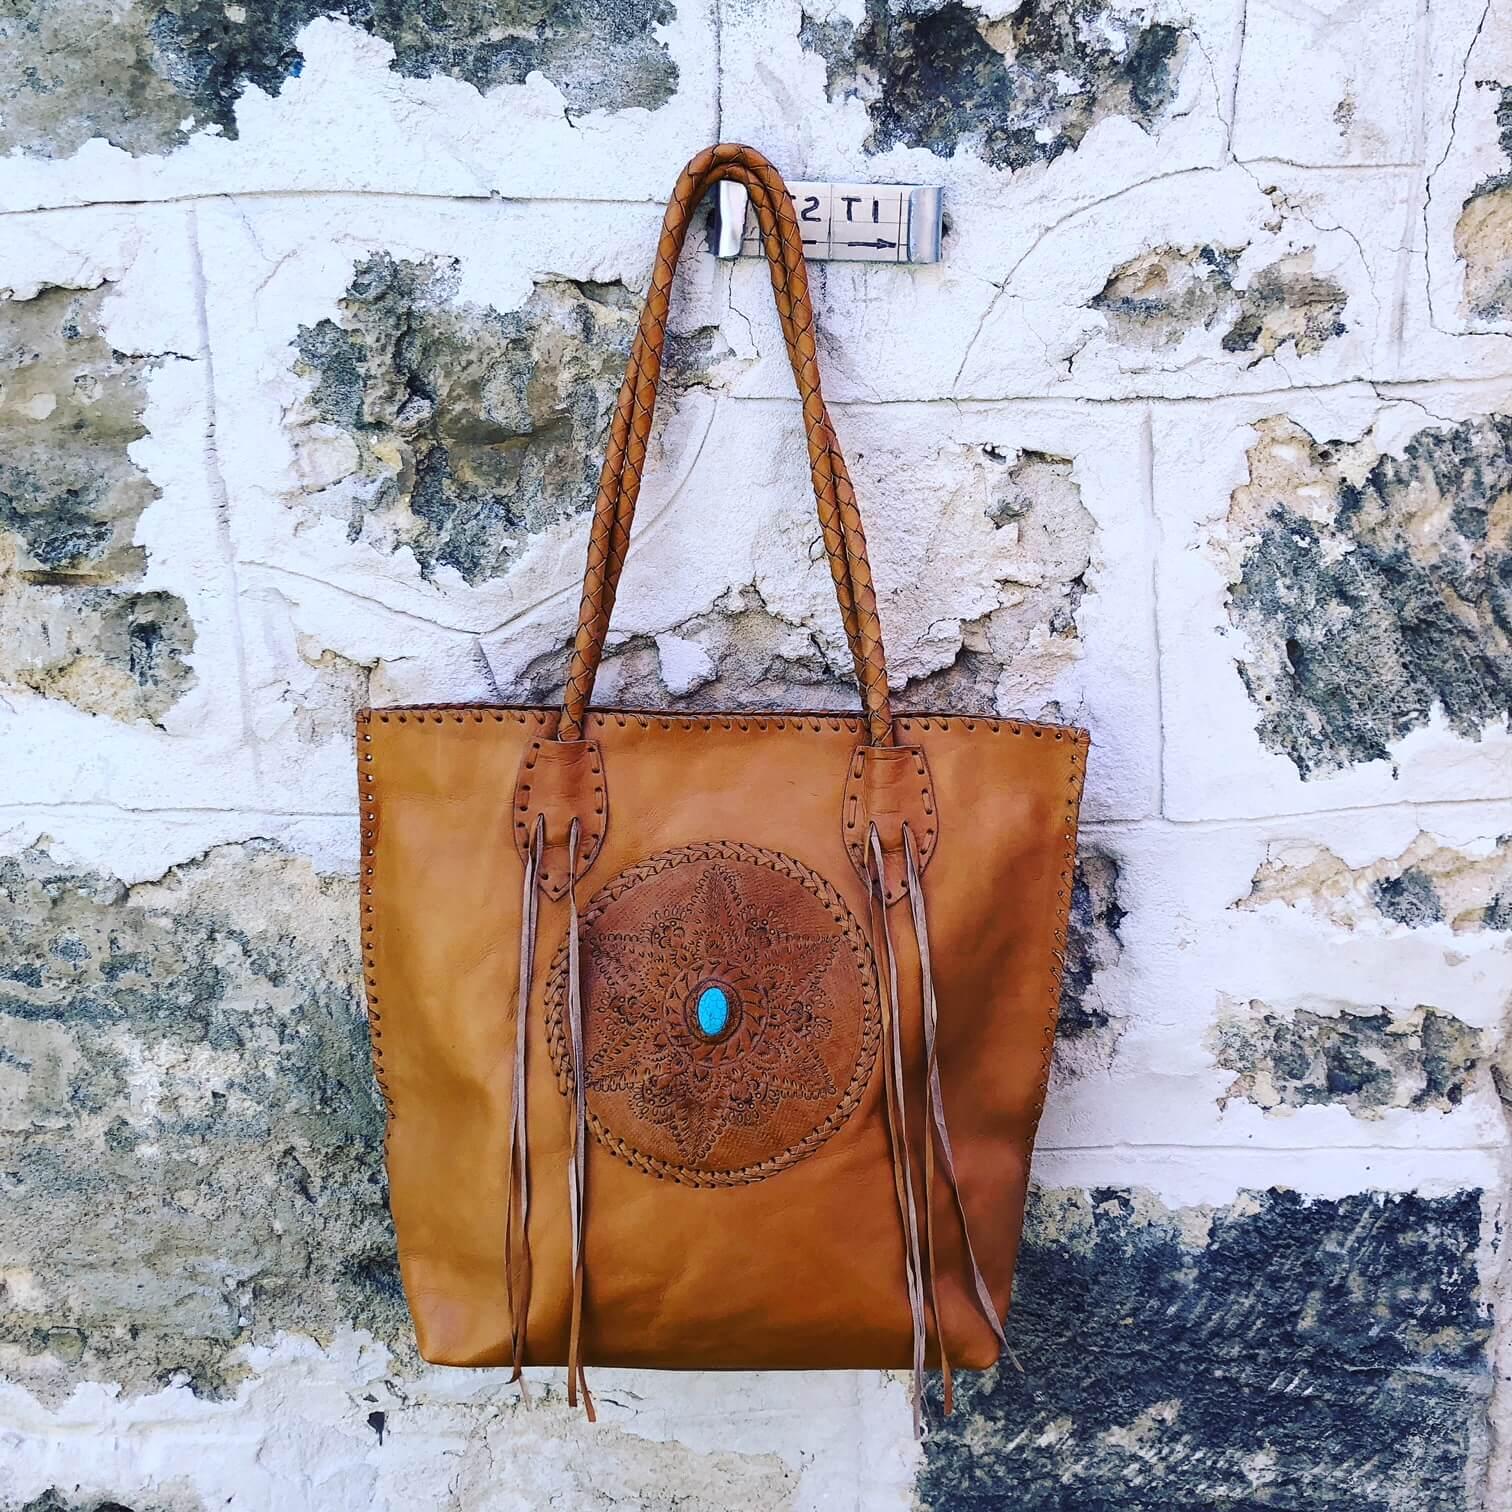 STITCH & TASSEL STONE BAG